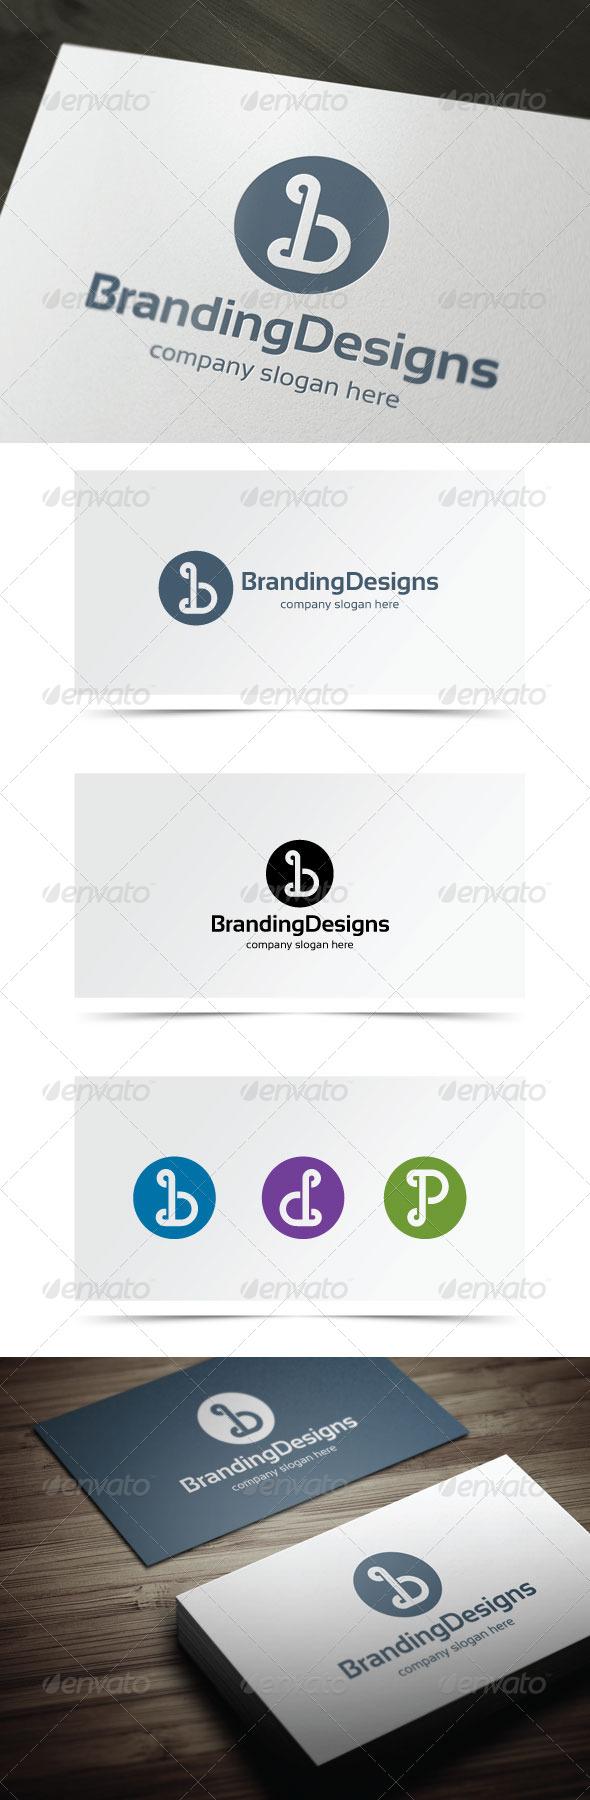 GraphicRiver Branding Designs 6562338